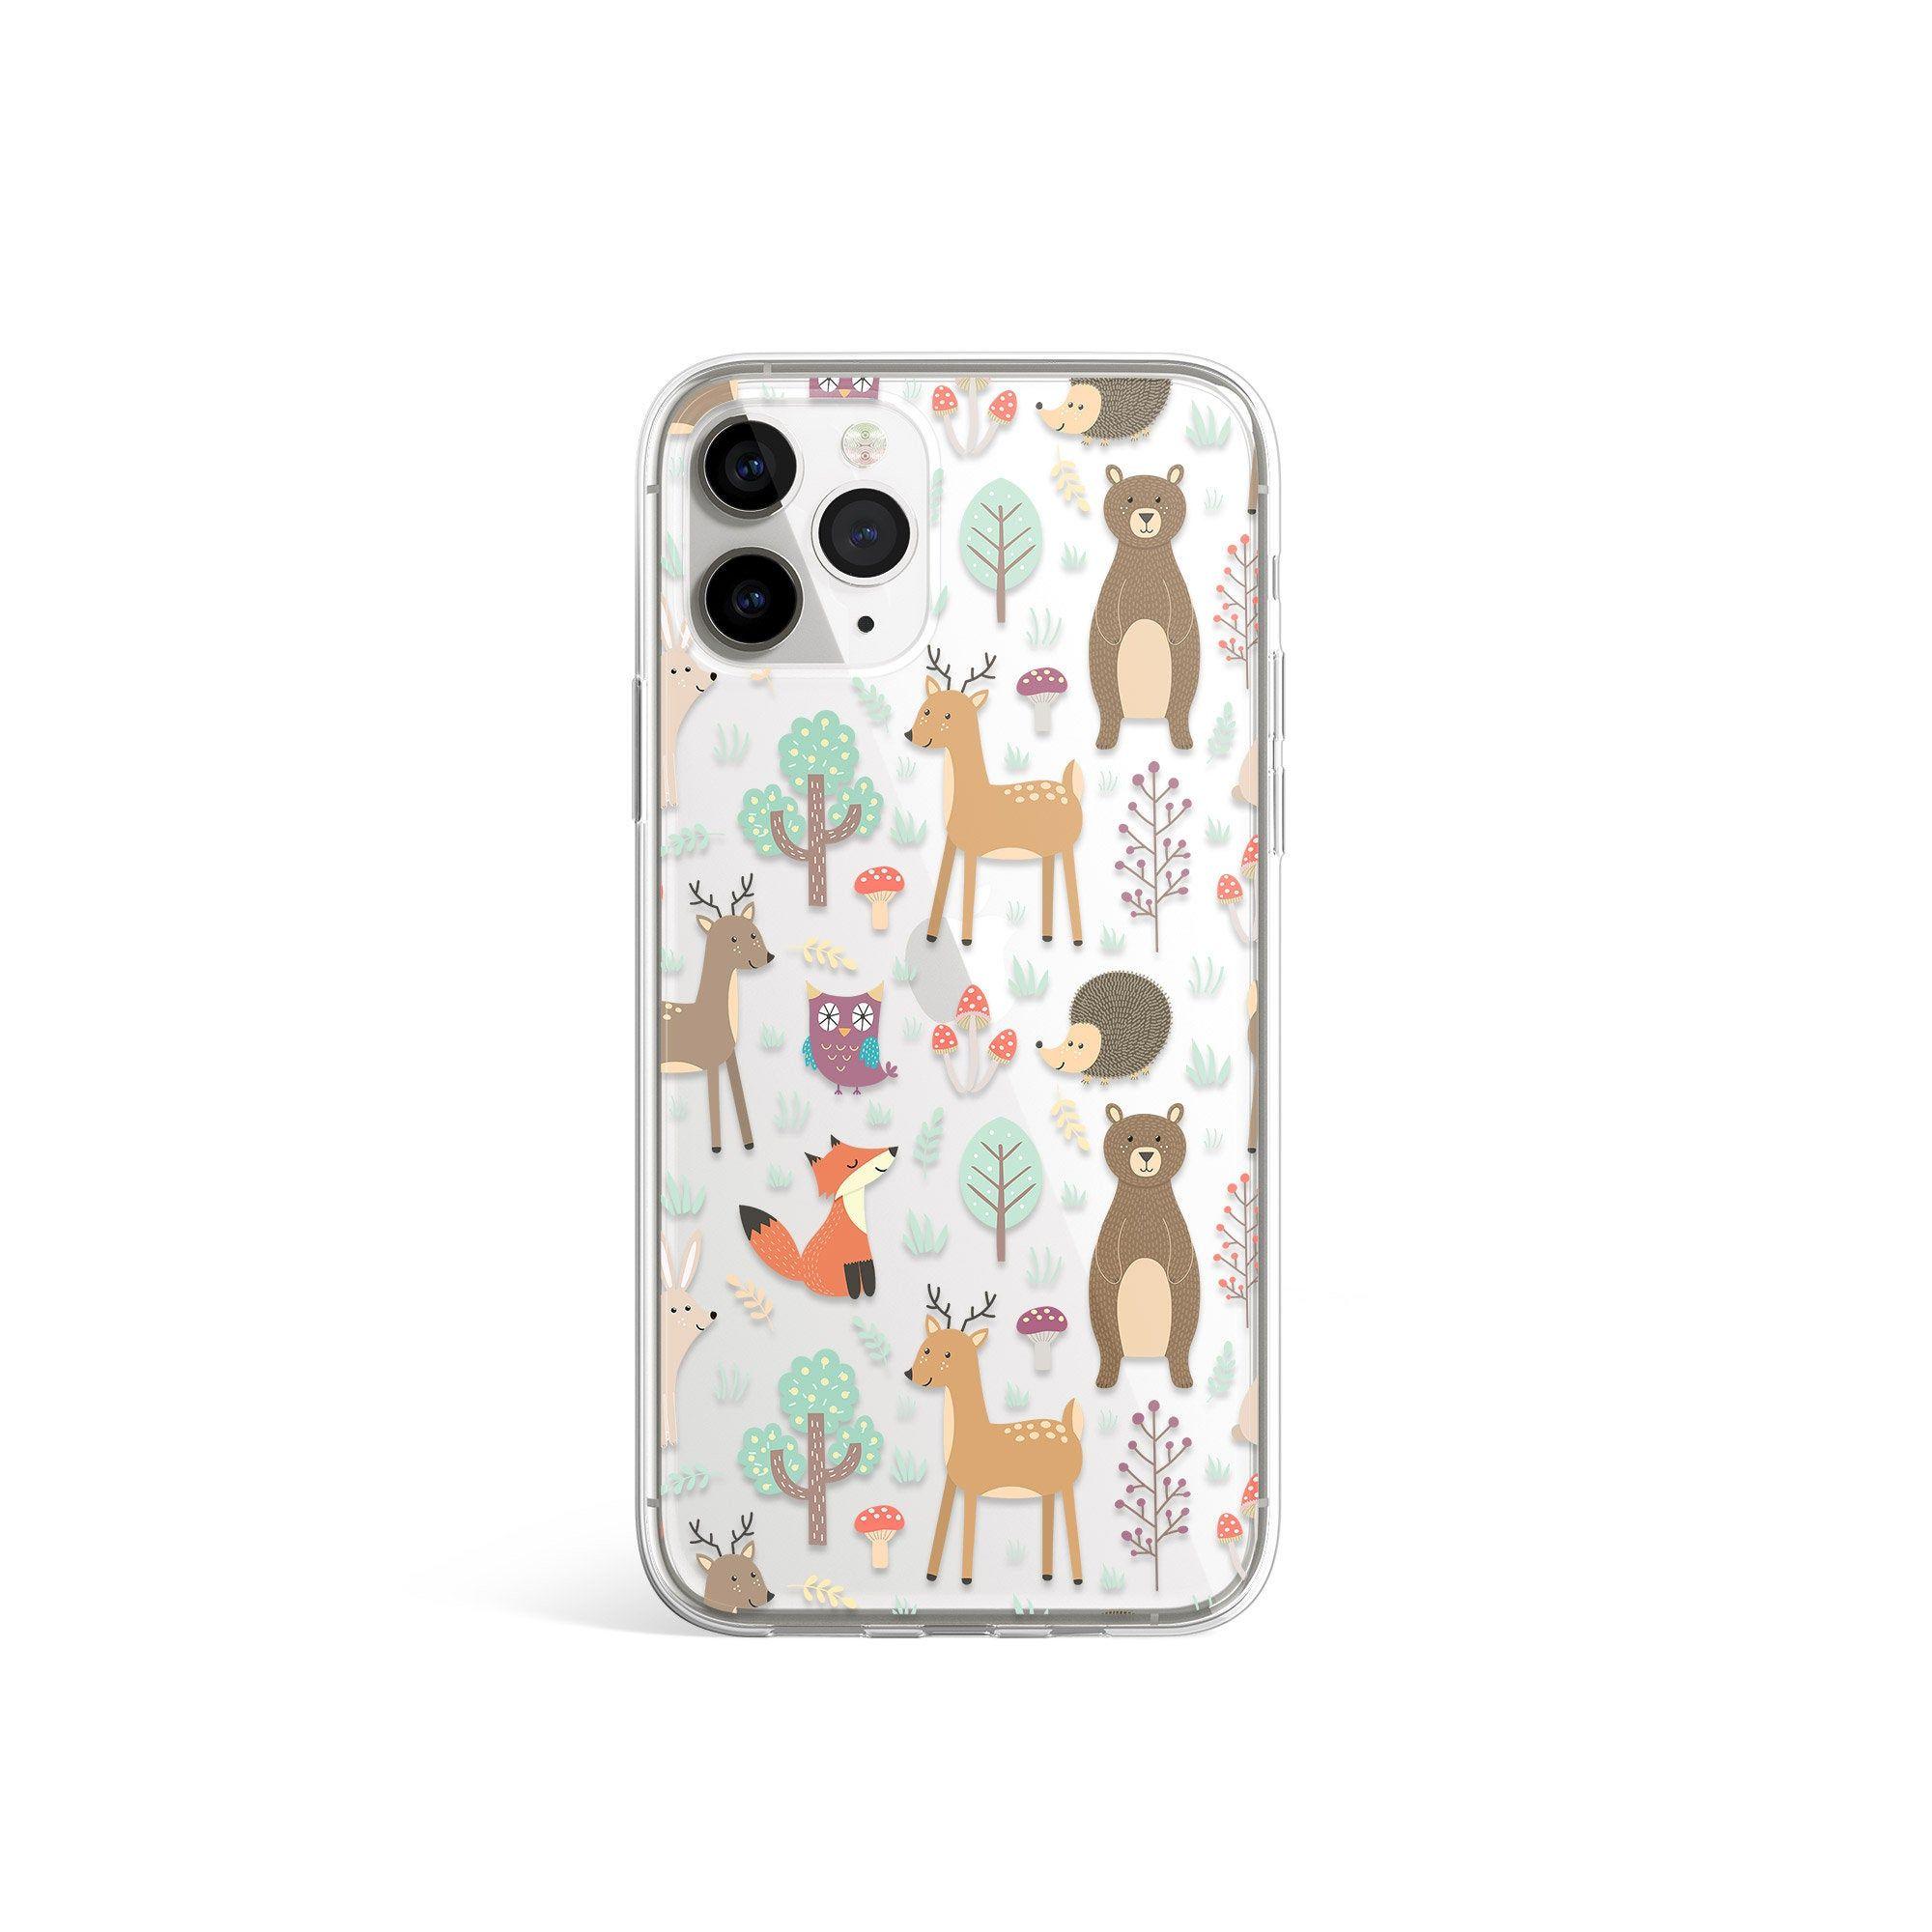 Marble iPhone Case iPhone 11 Pro Max Silicone Case iPhone X Xs Xr iPhone 7 8 Plus Case iPhone 12 Pro Mini Case Tiramisu Cheesecake